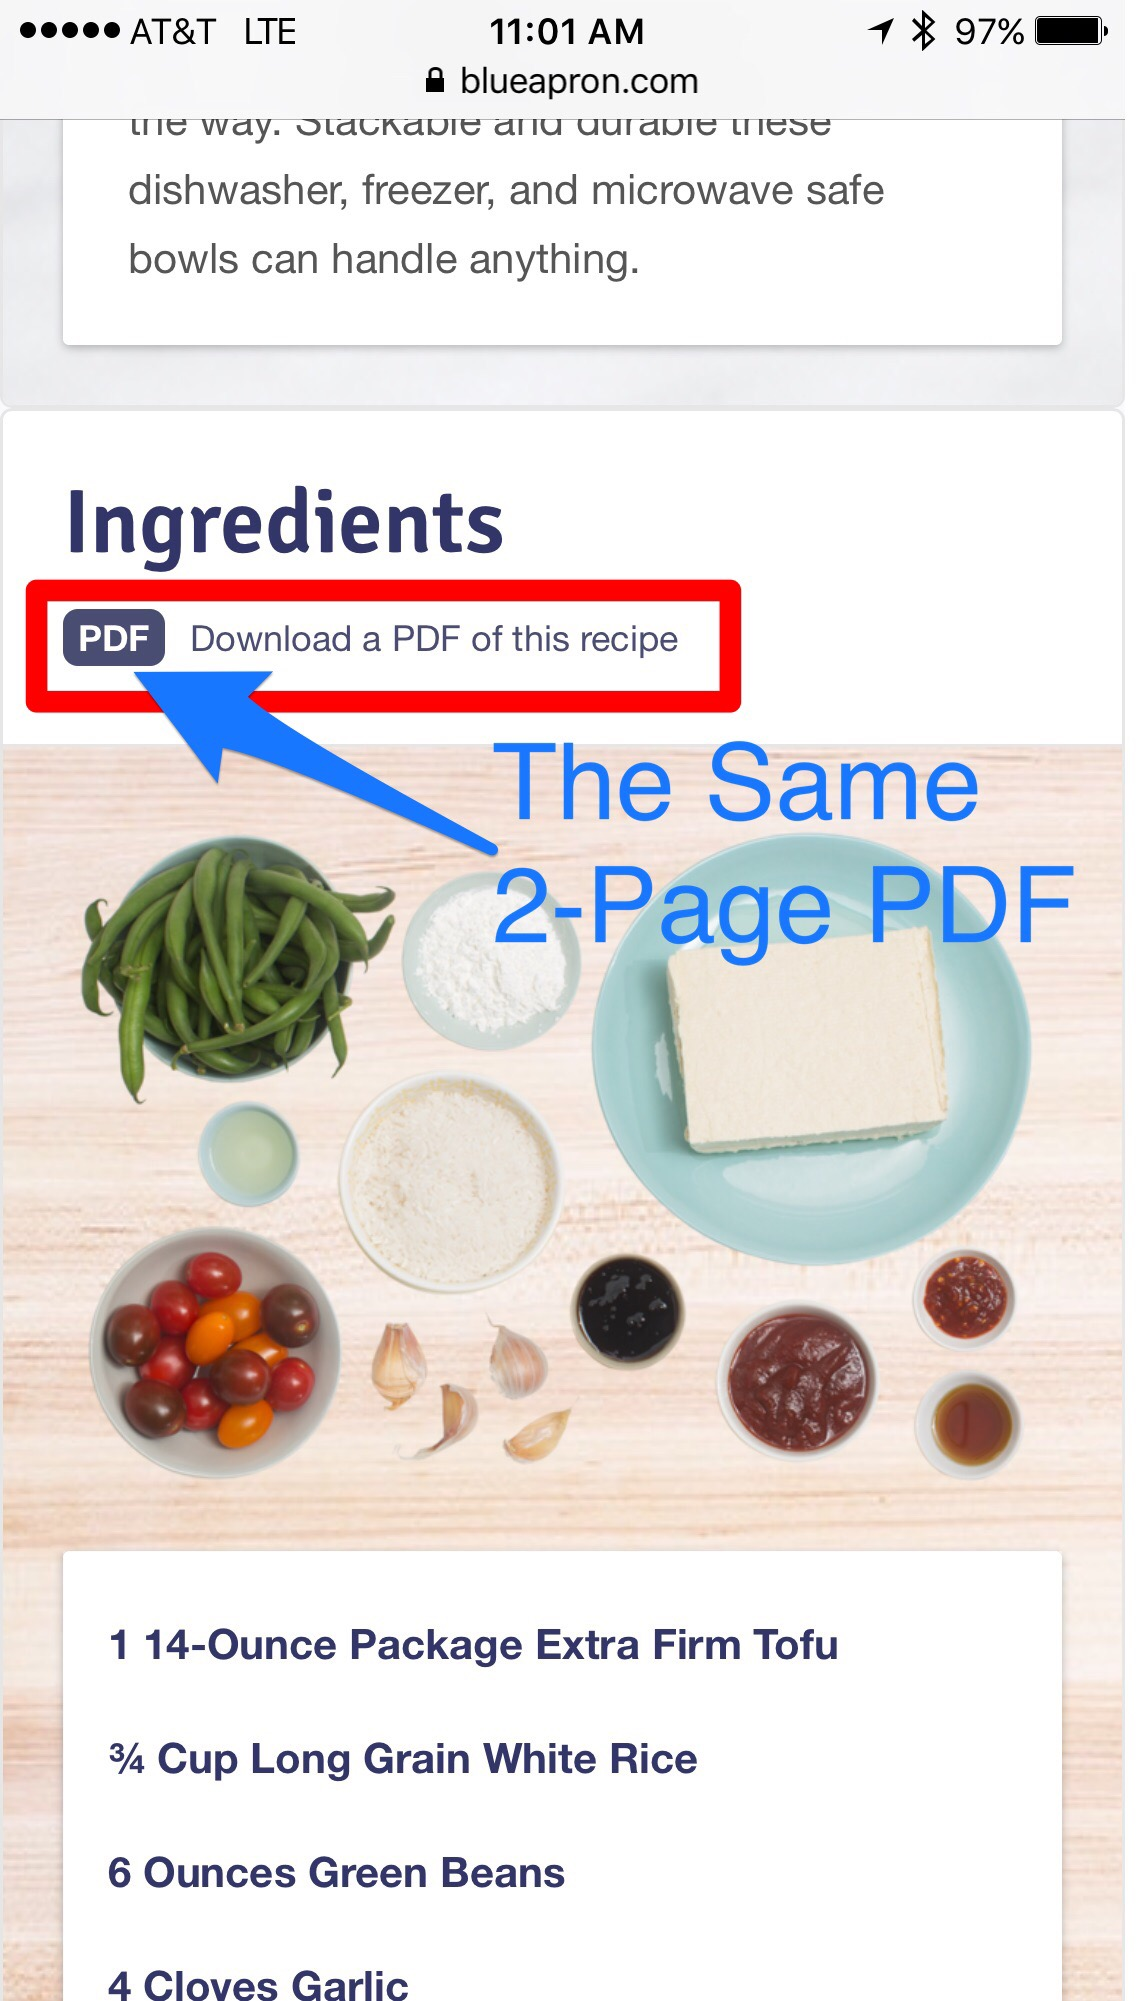 blue apron recipe sheet download